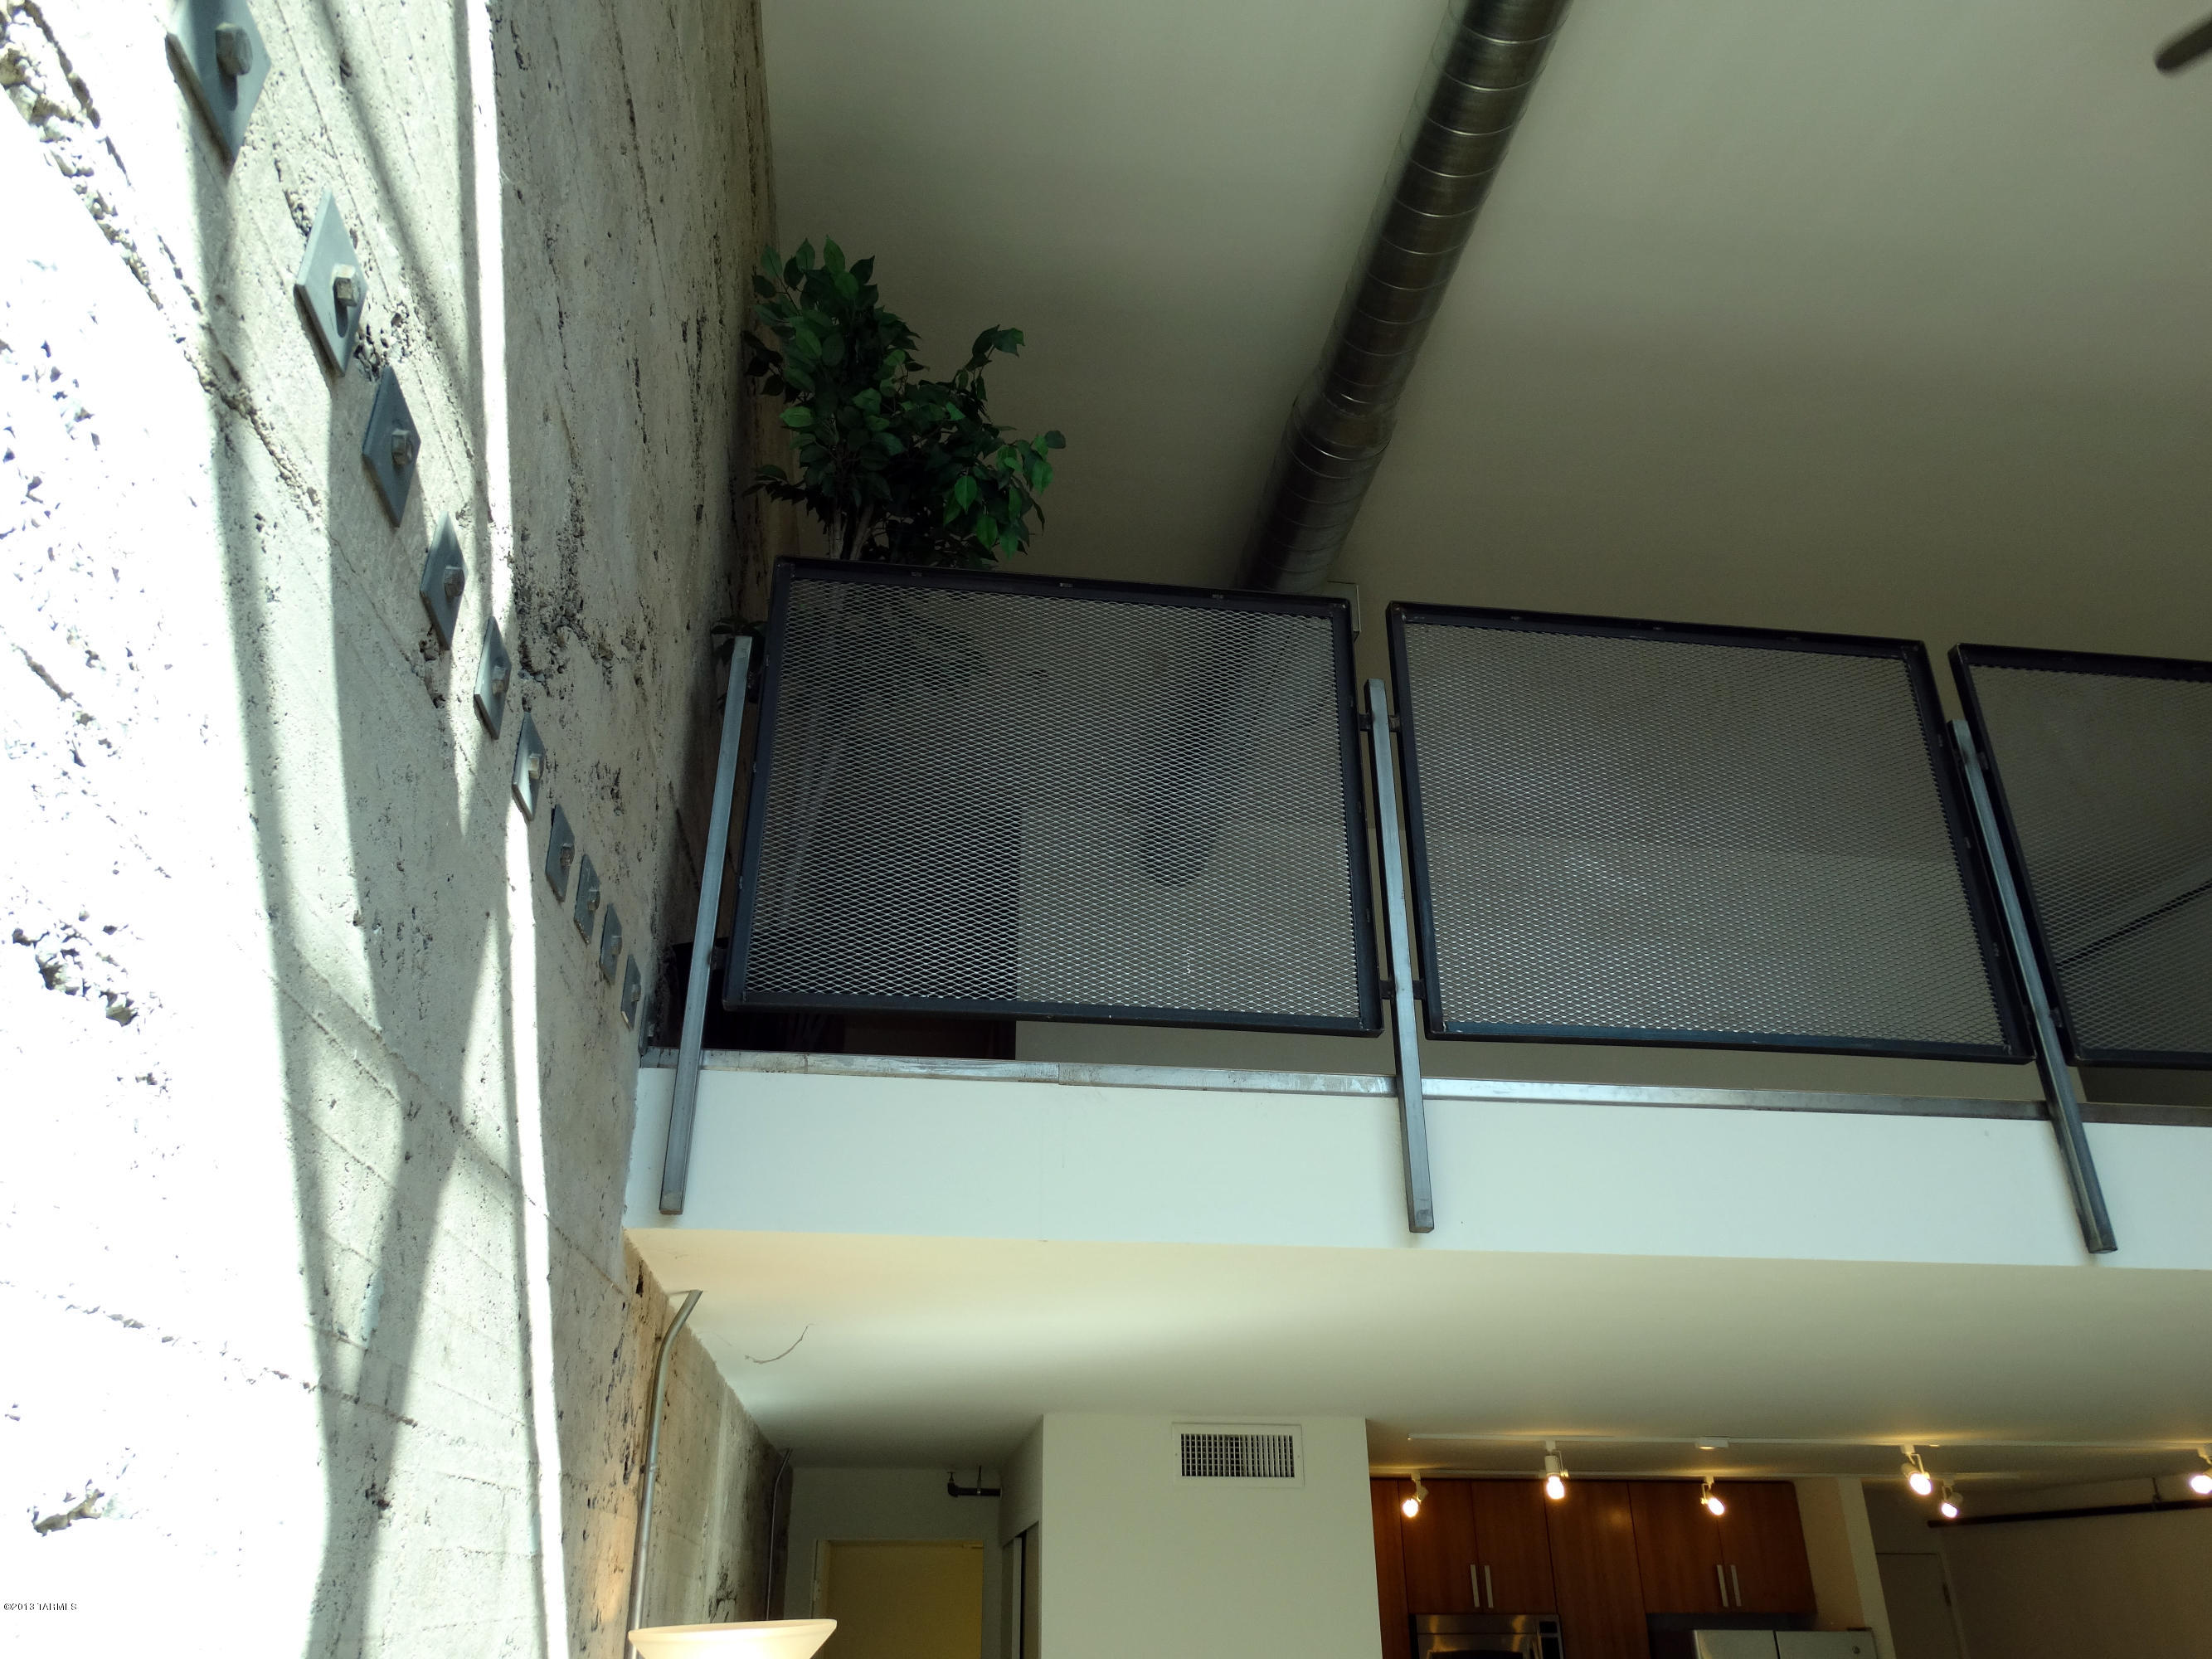 Astonishing Ice House Loft 111 Near Downtown Tucson Az Is For Sale Download Free Architecture Designs Fluibritishbridgeorg